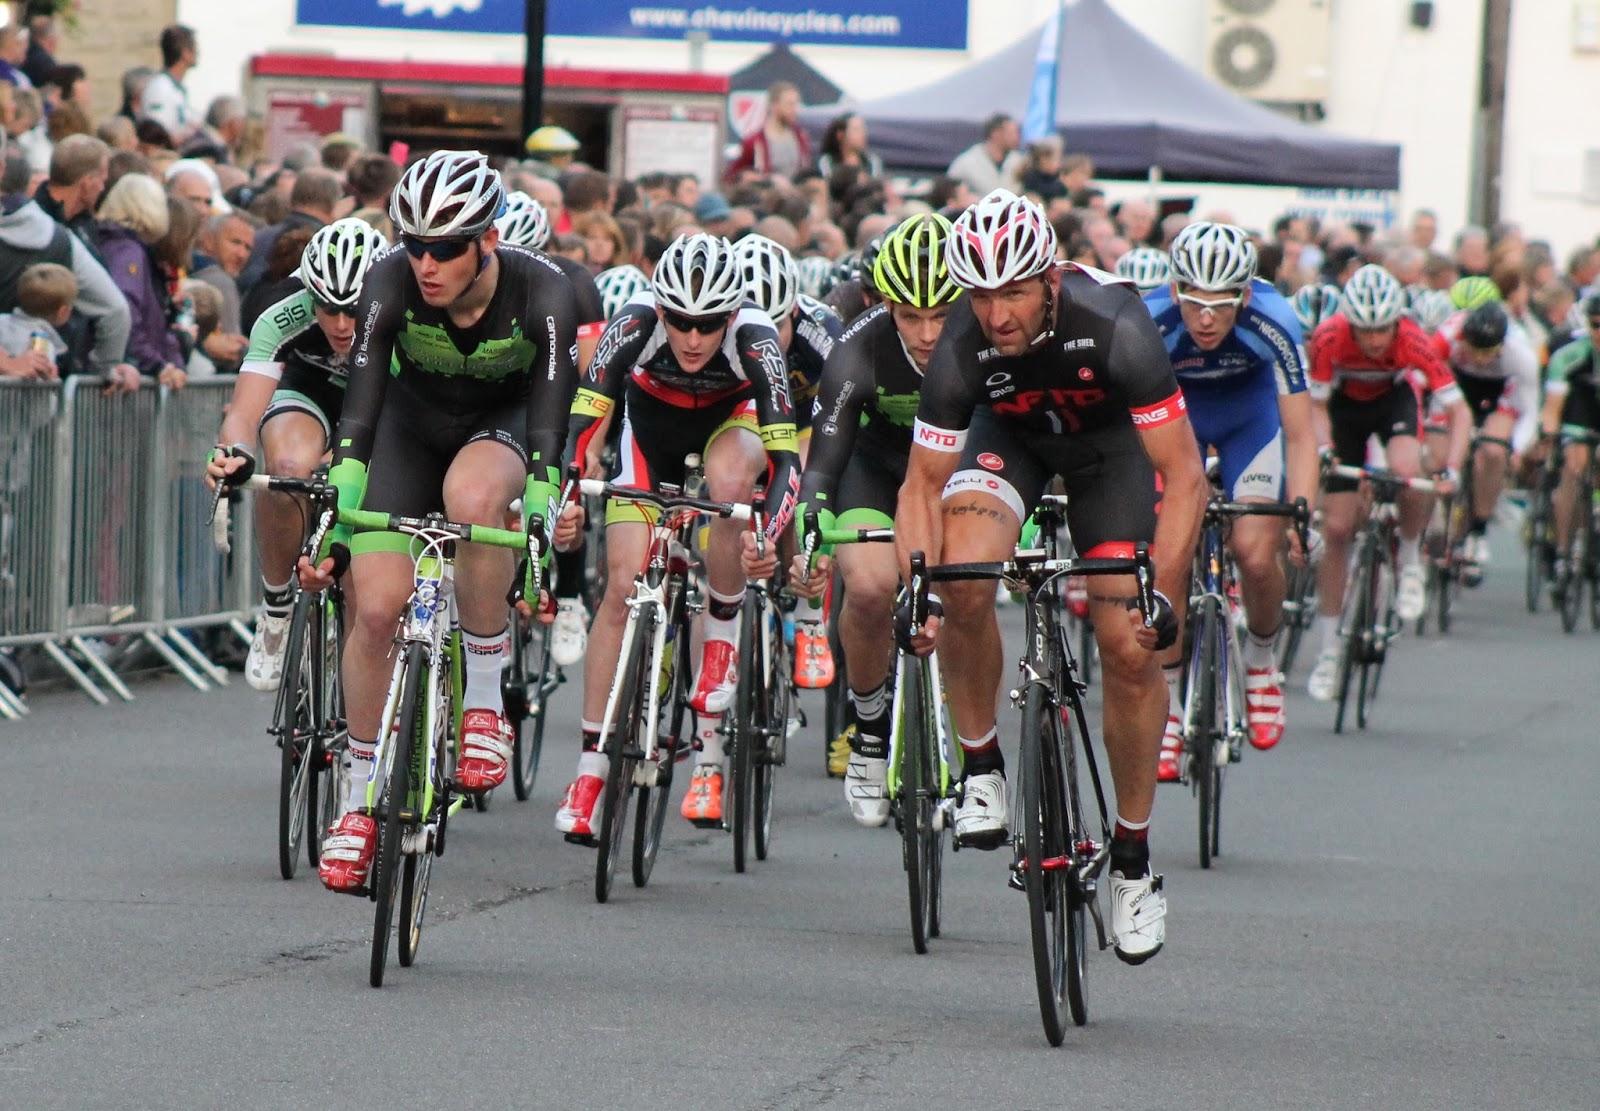 2020 LOGCO Otley Cycle Races @ Otley Town Centre